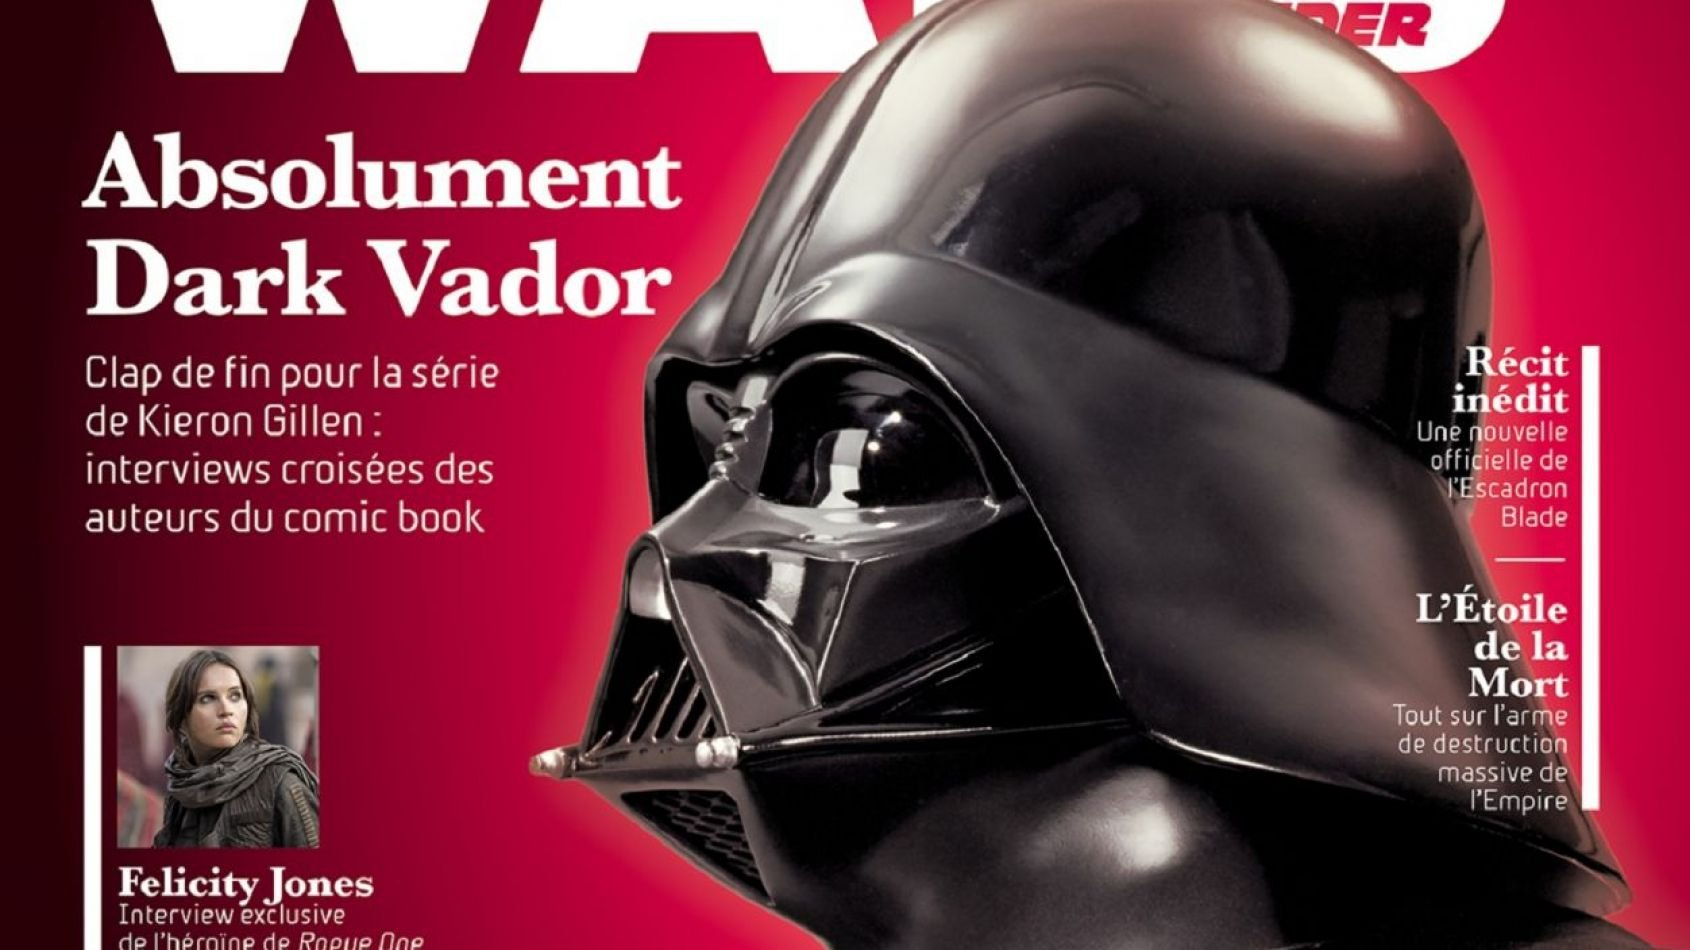 Panini : La couverture du Star Wars Insider 12